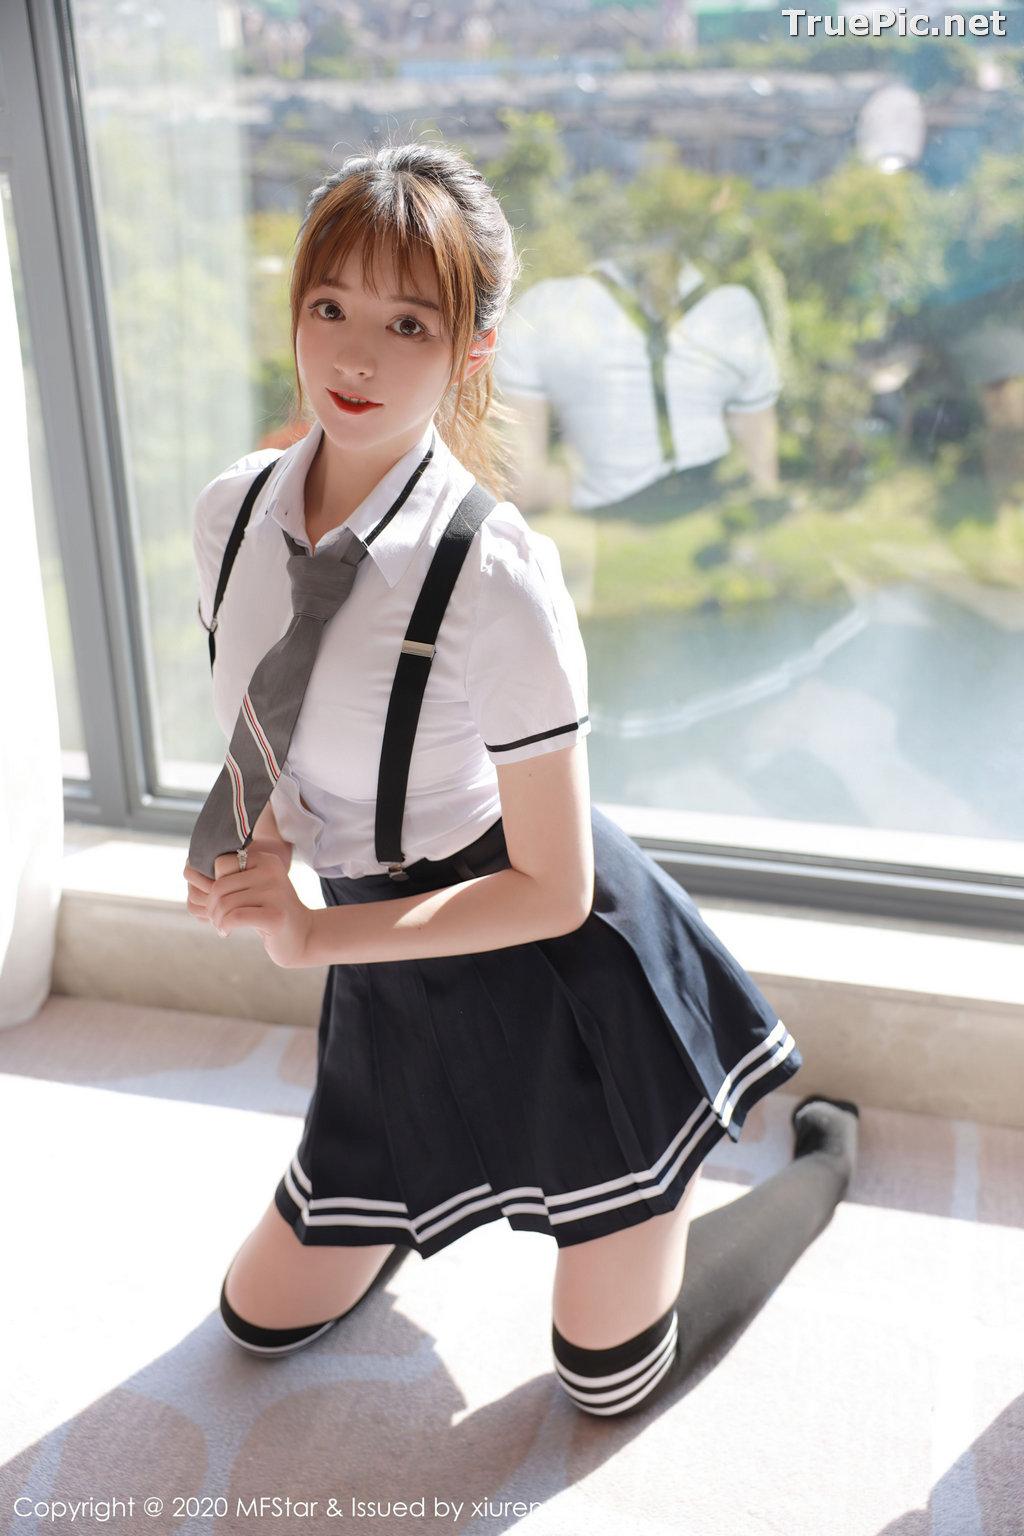 Image MFStar Vol.390 - Chinese Model - yoo优优 - Sexy Student Uniform - TruePic.net - Picture-6